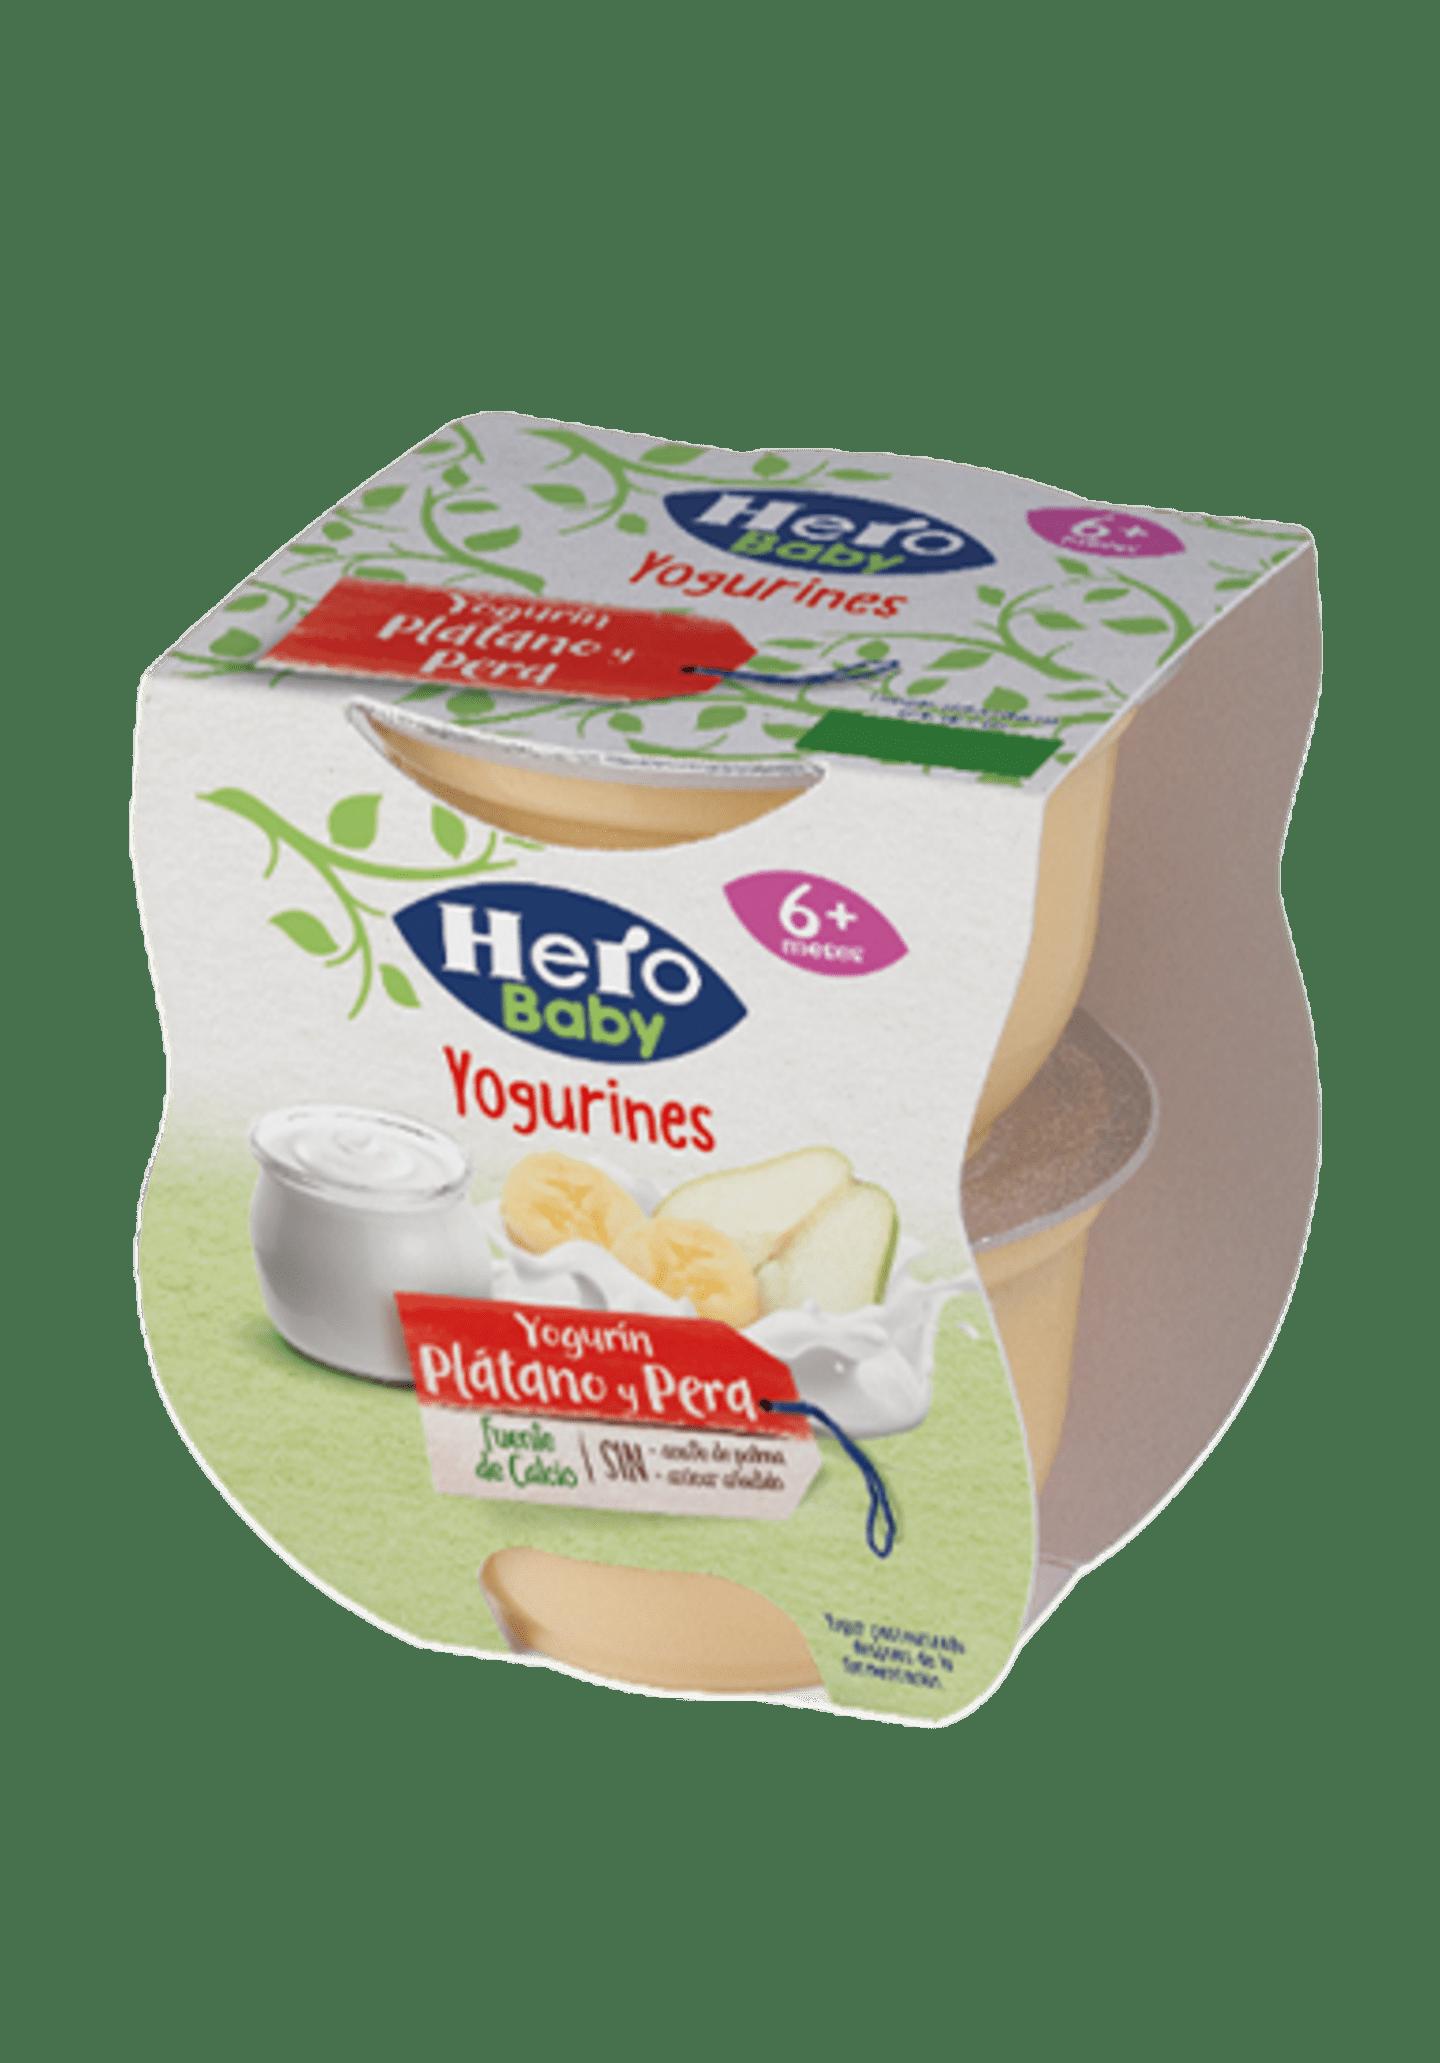 tarrinas yogurin platano y pera